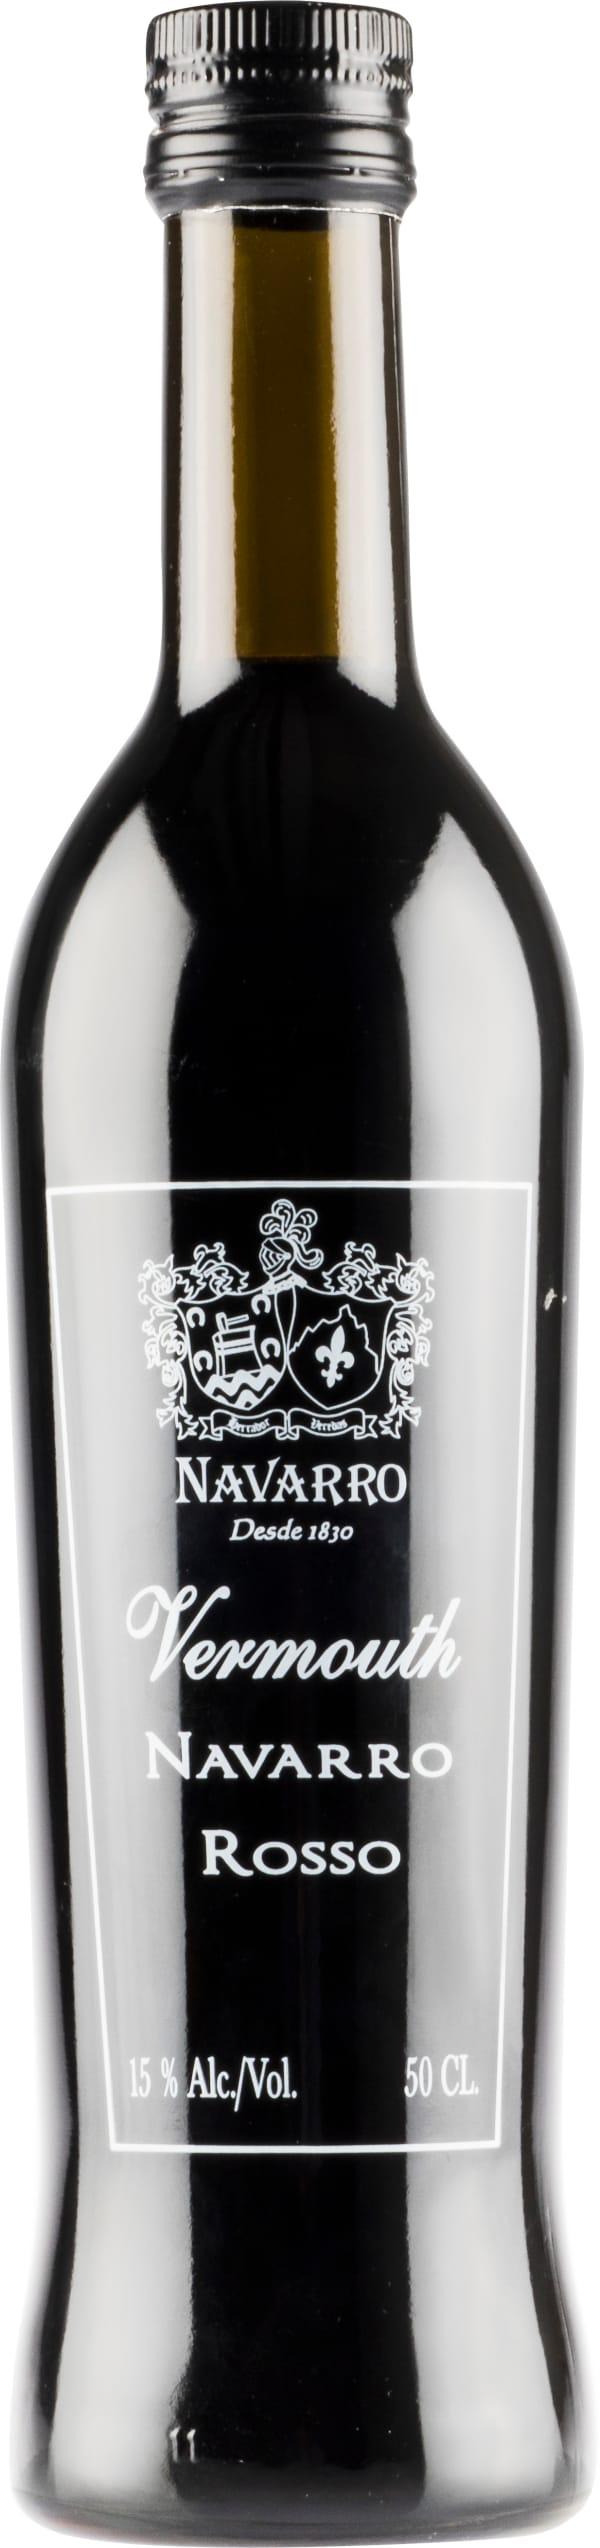 Navarro Premium Rosso Vermouth